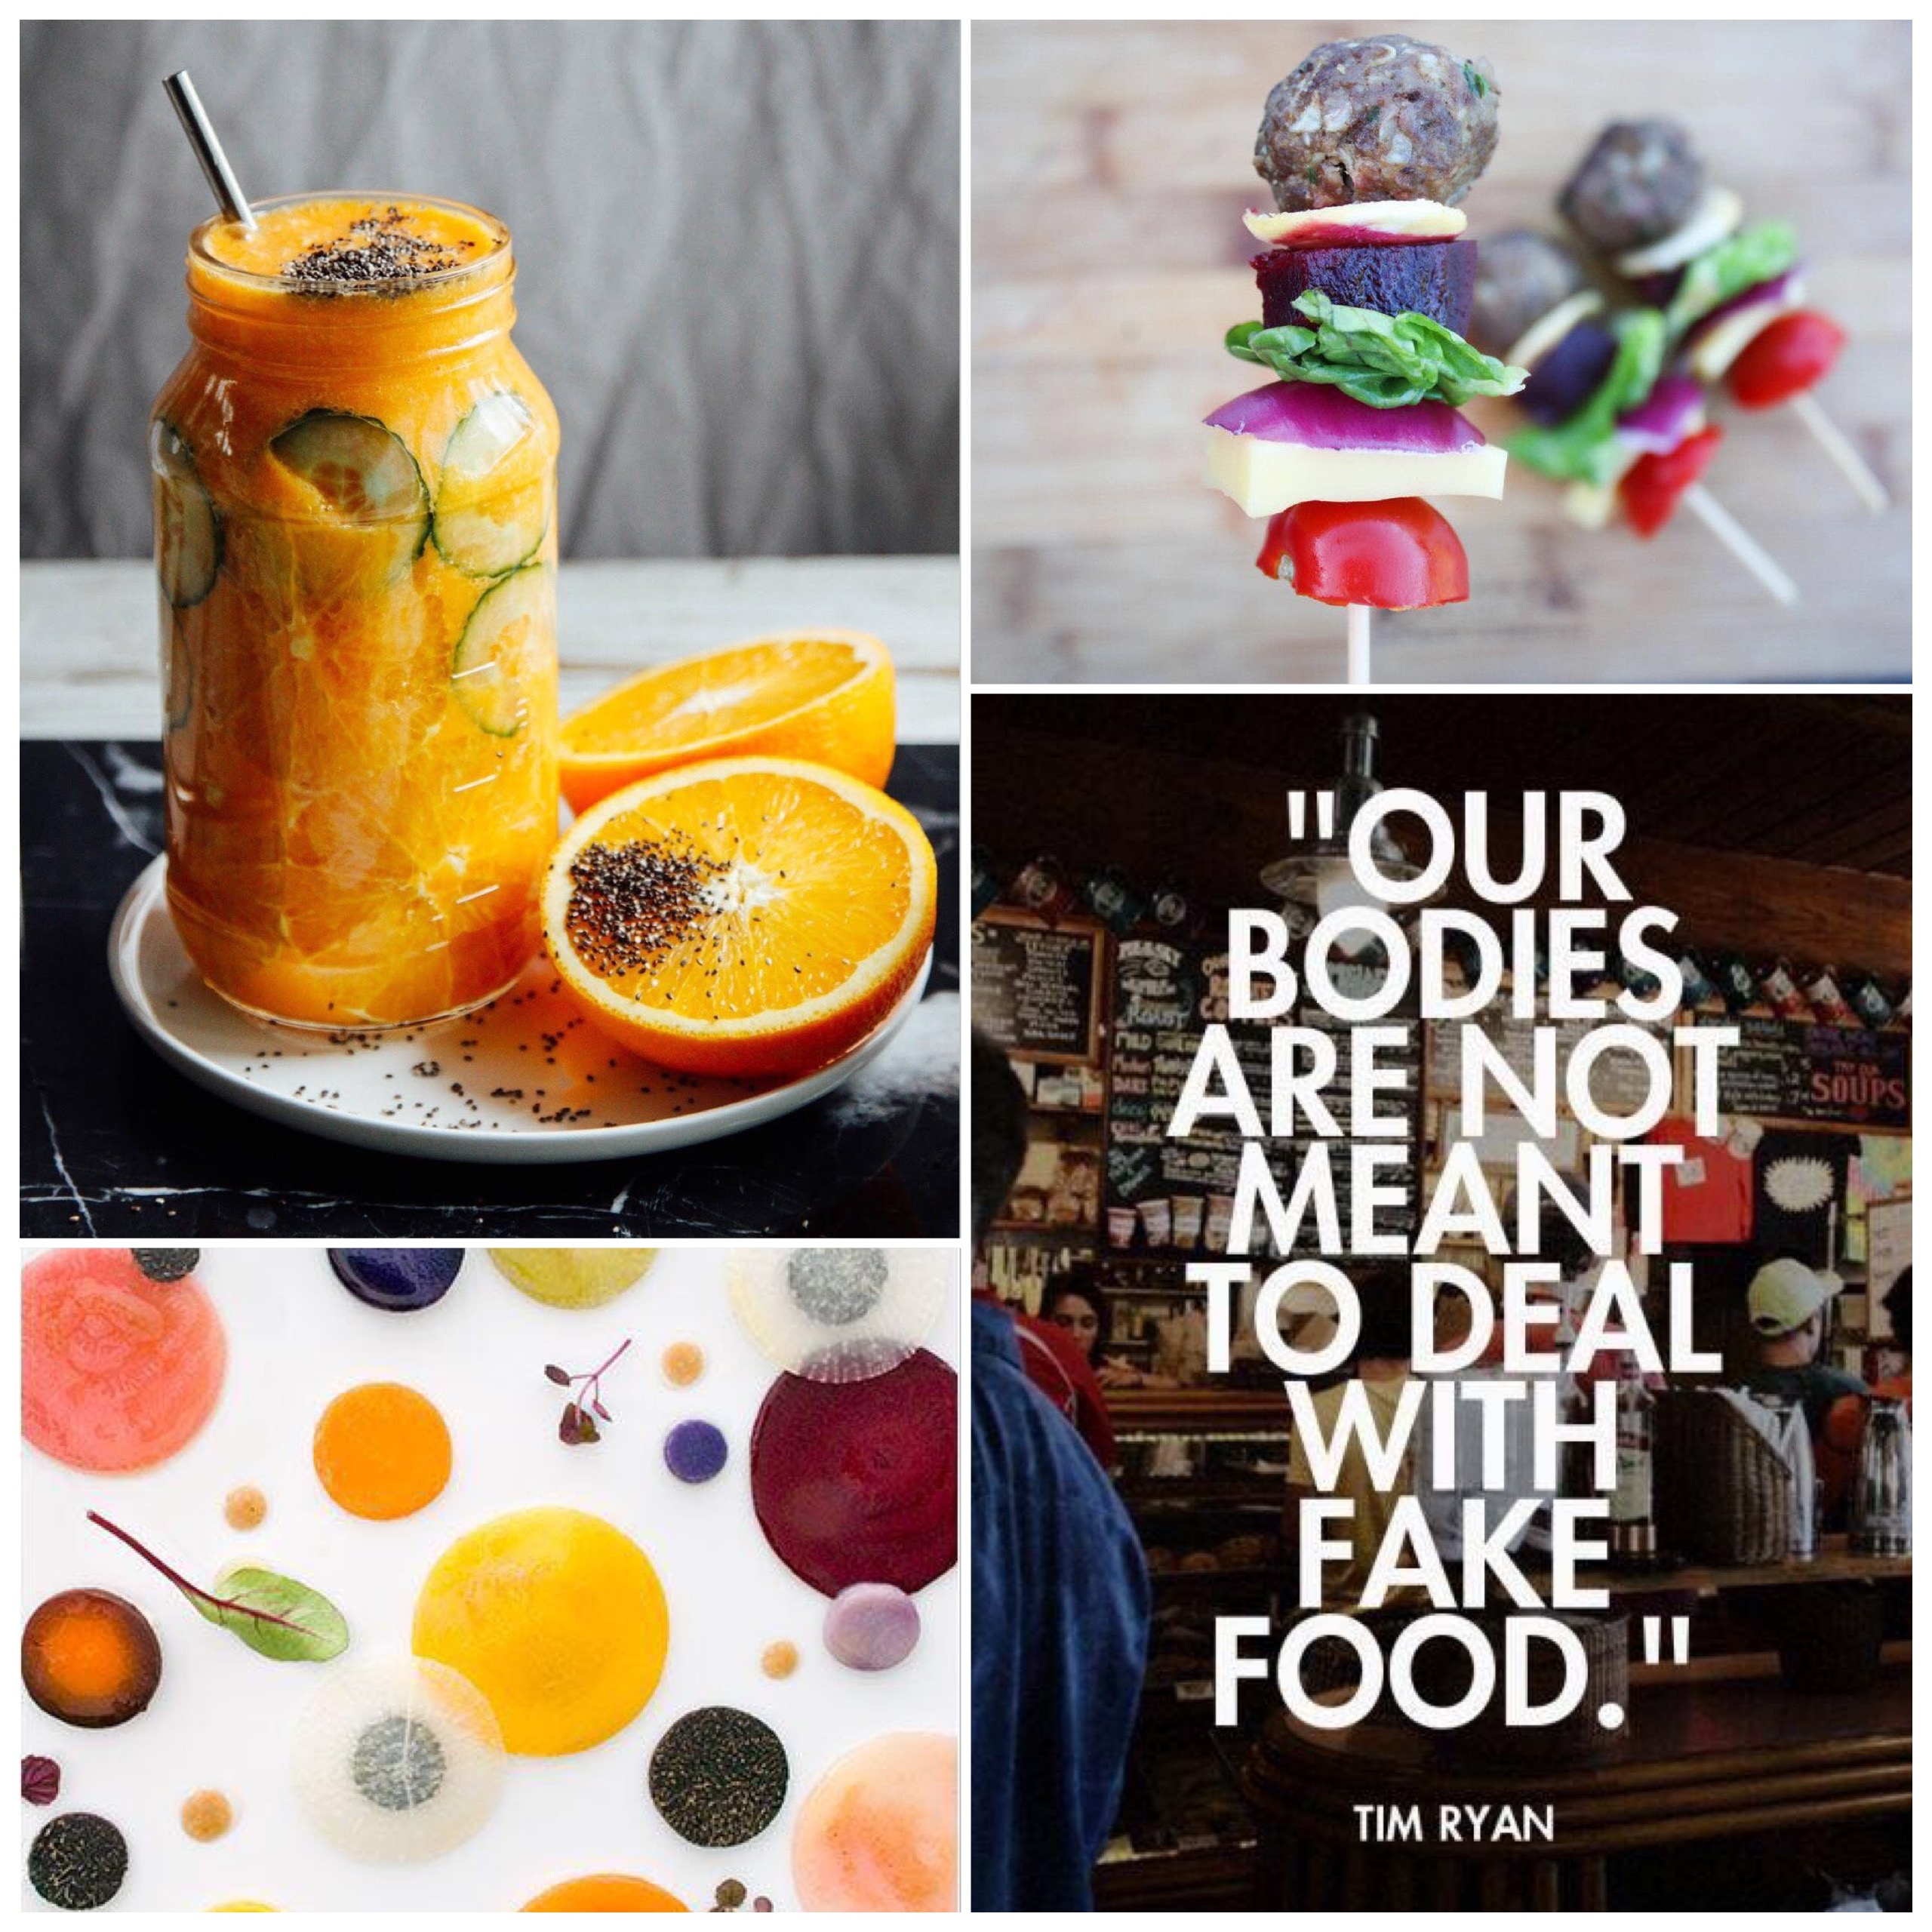 Fab Friday - macadamia milk, coconut, pineapple juice, burger on a stick no bun, food art, fake food quote